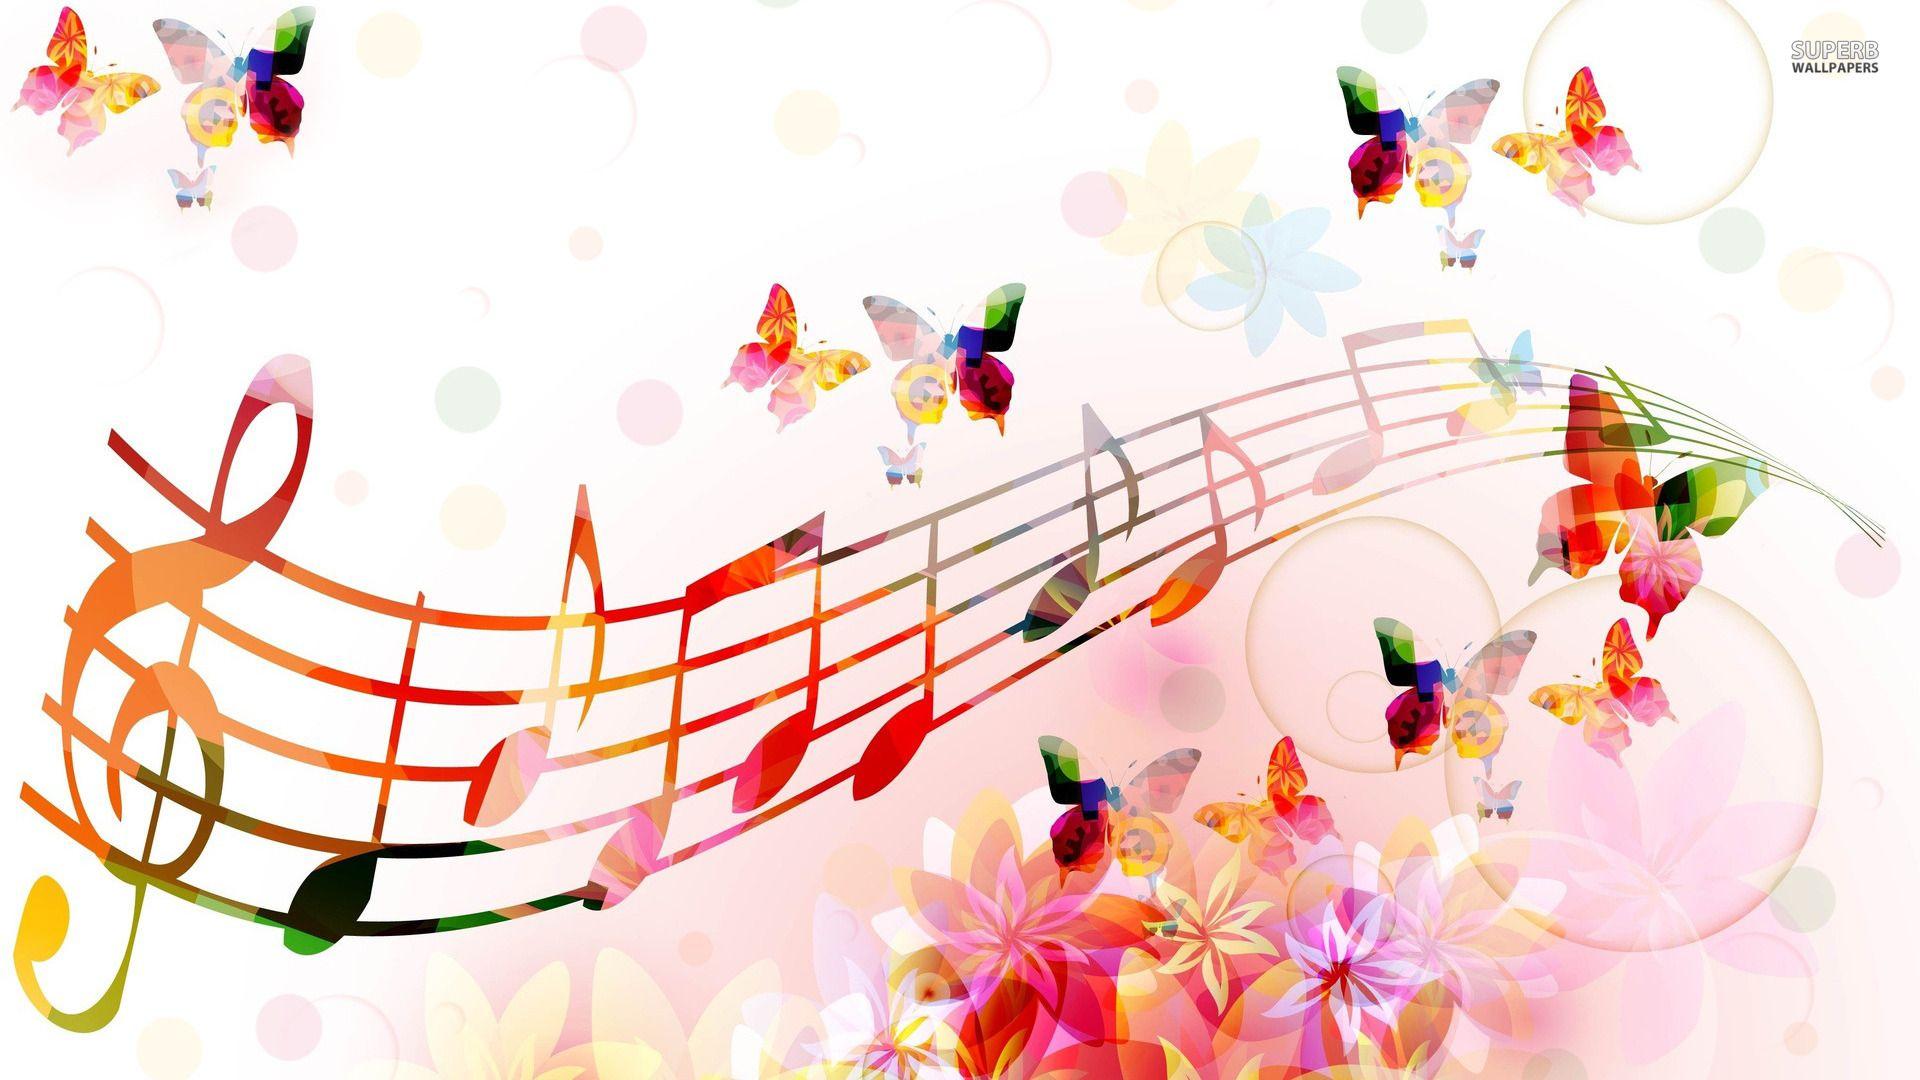 Popular Wallpaper Music Kawaii - c6b21854f411ec81860247a1e12cc174  Photograph_952957.jpg